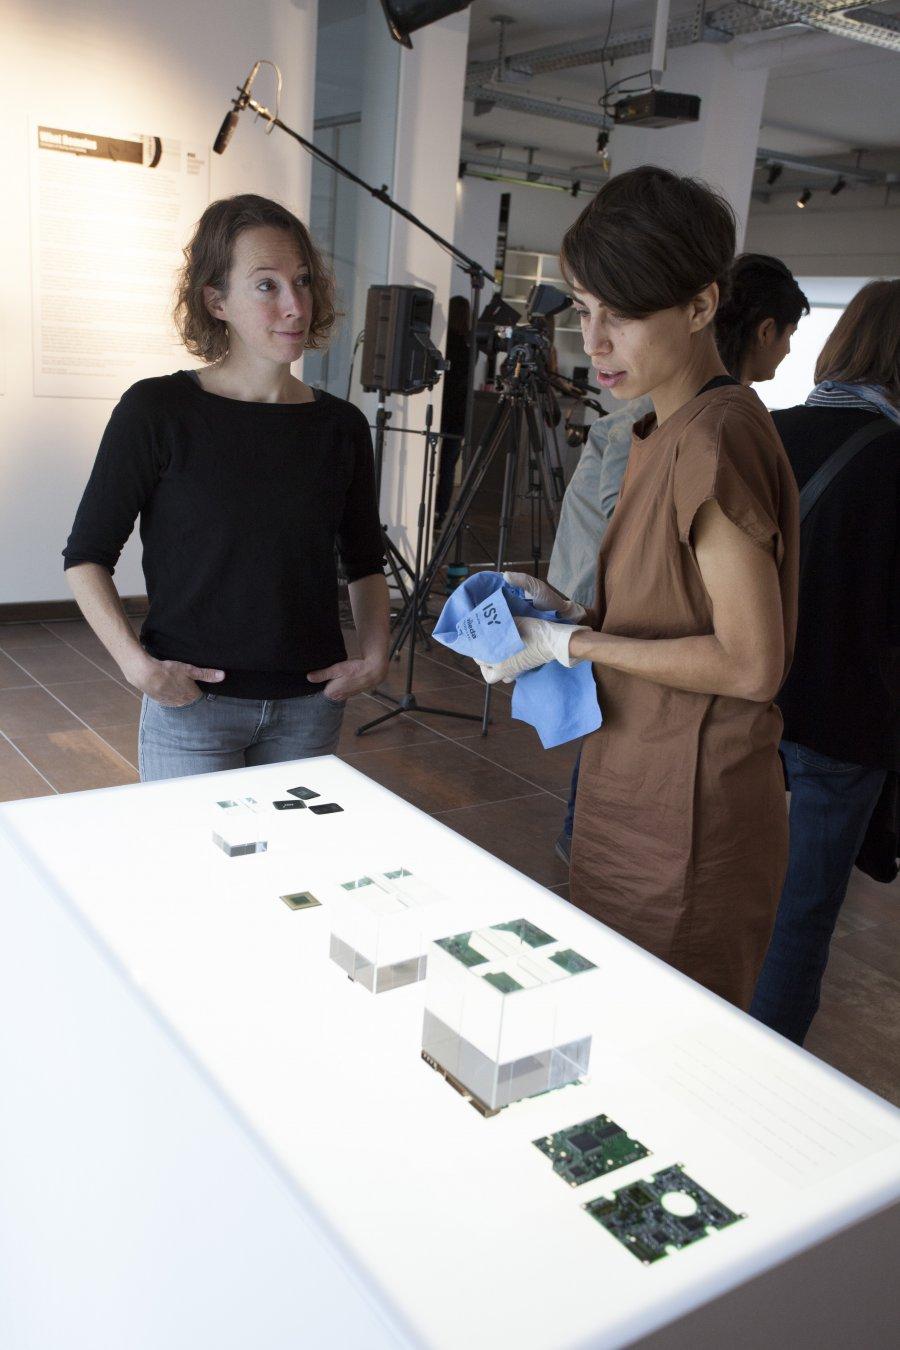 Marloes de Valk und Michaela Lakova, © esc medien kunst labor